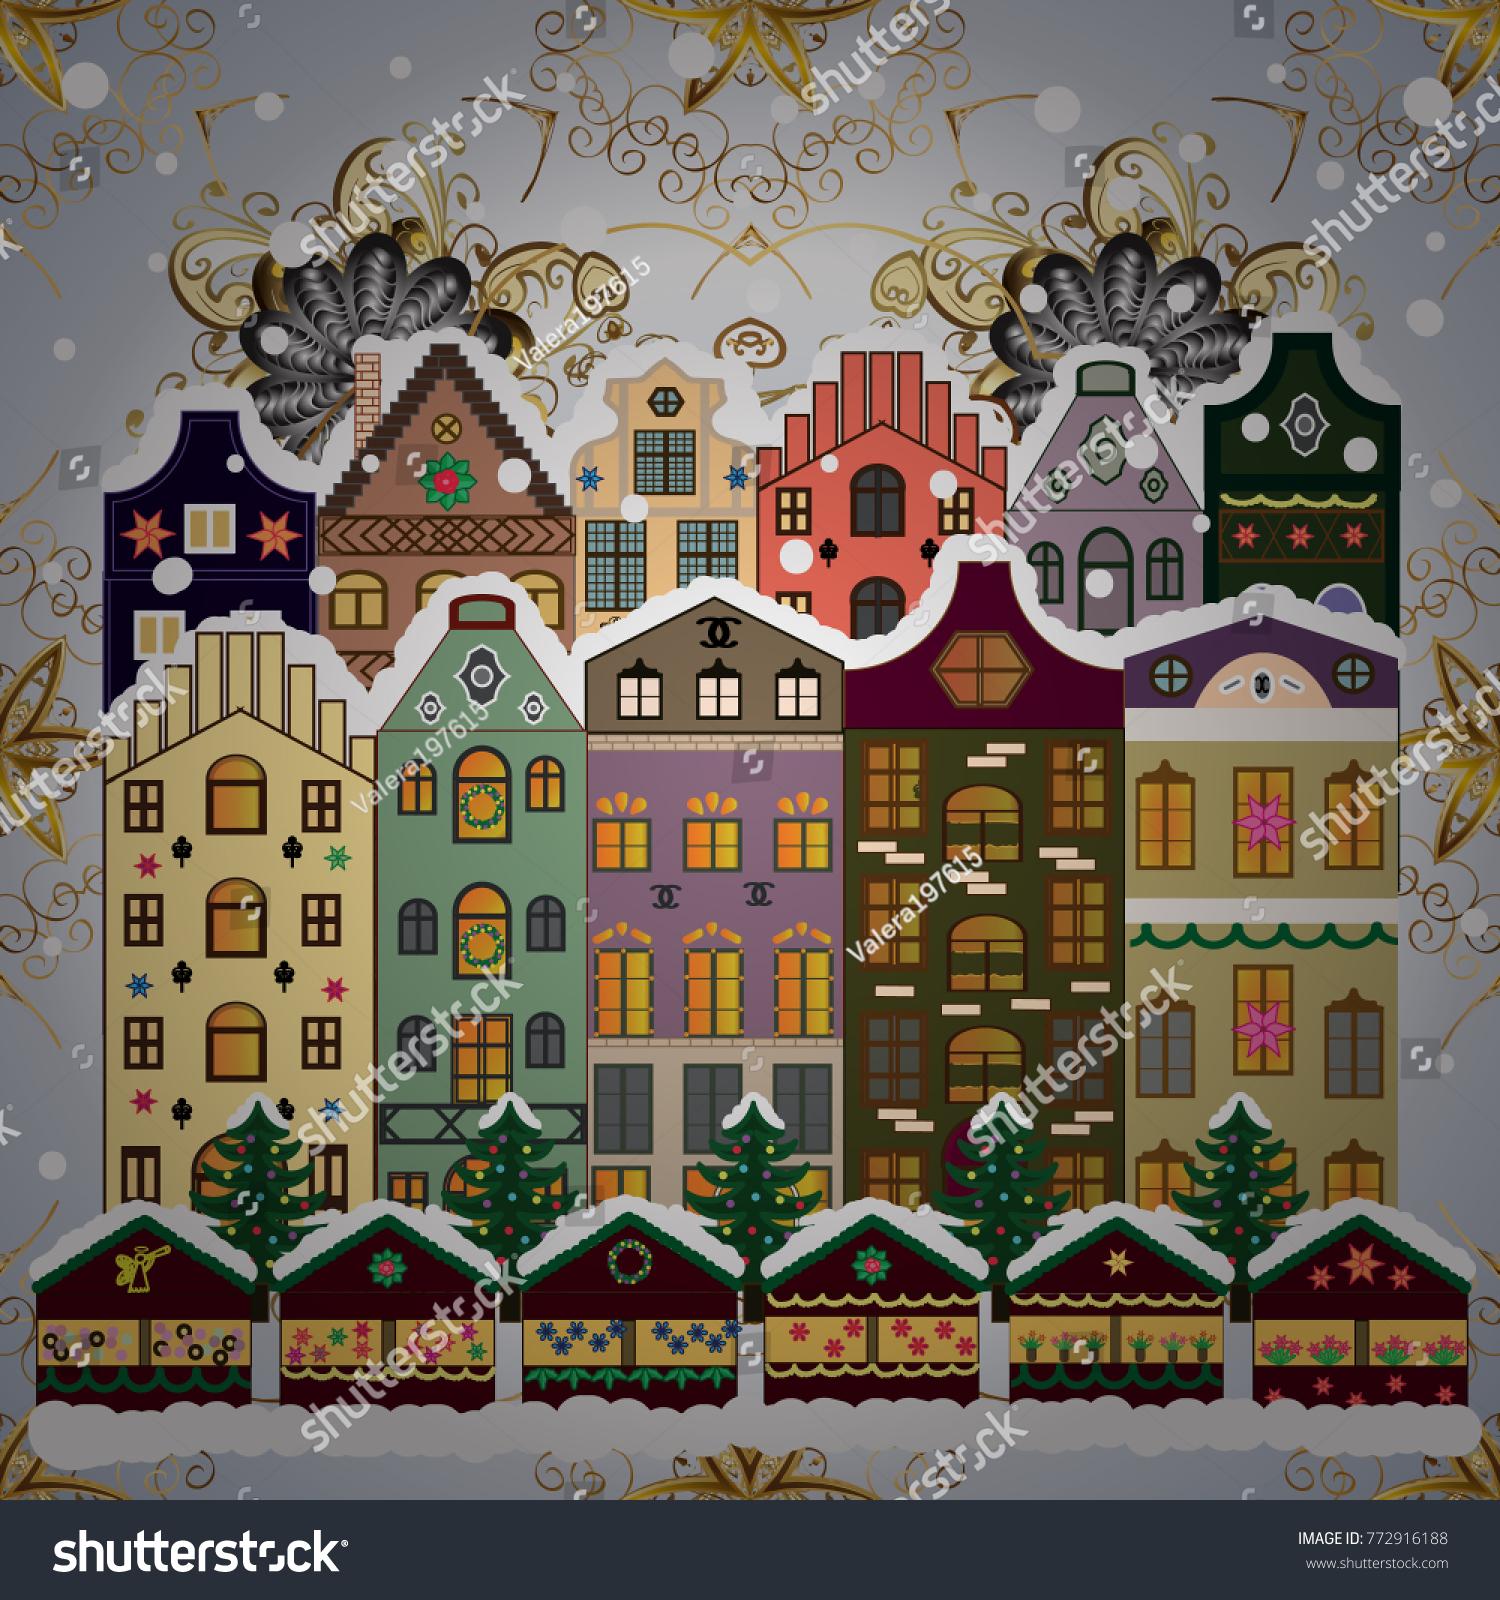 Christmas happy new year greeting card stock vector 772916188 christmas and happy new year greeting card holidays vector illustration vector illustration kristyandbryce Gallery